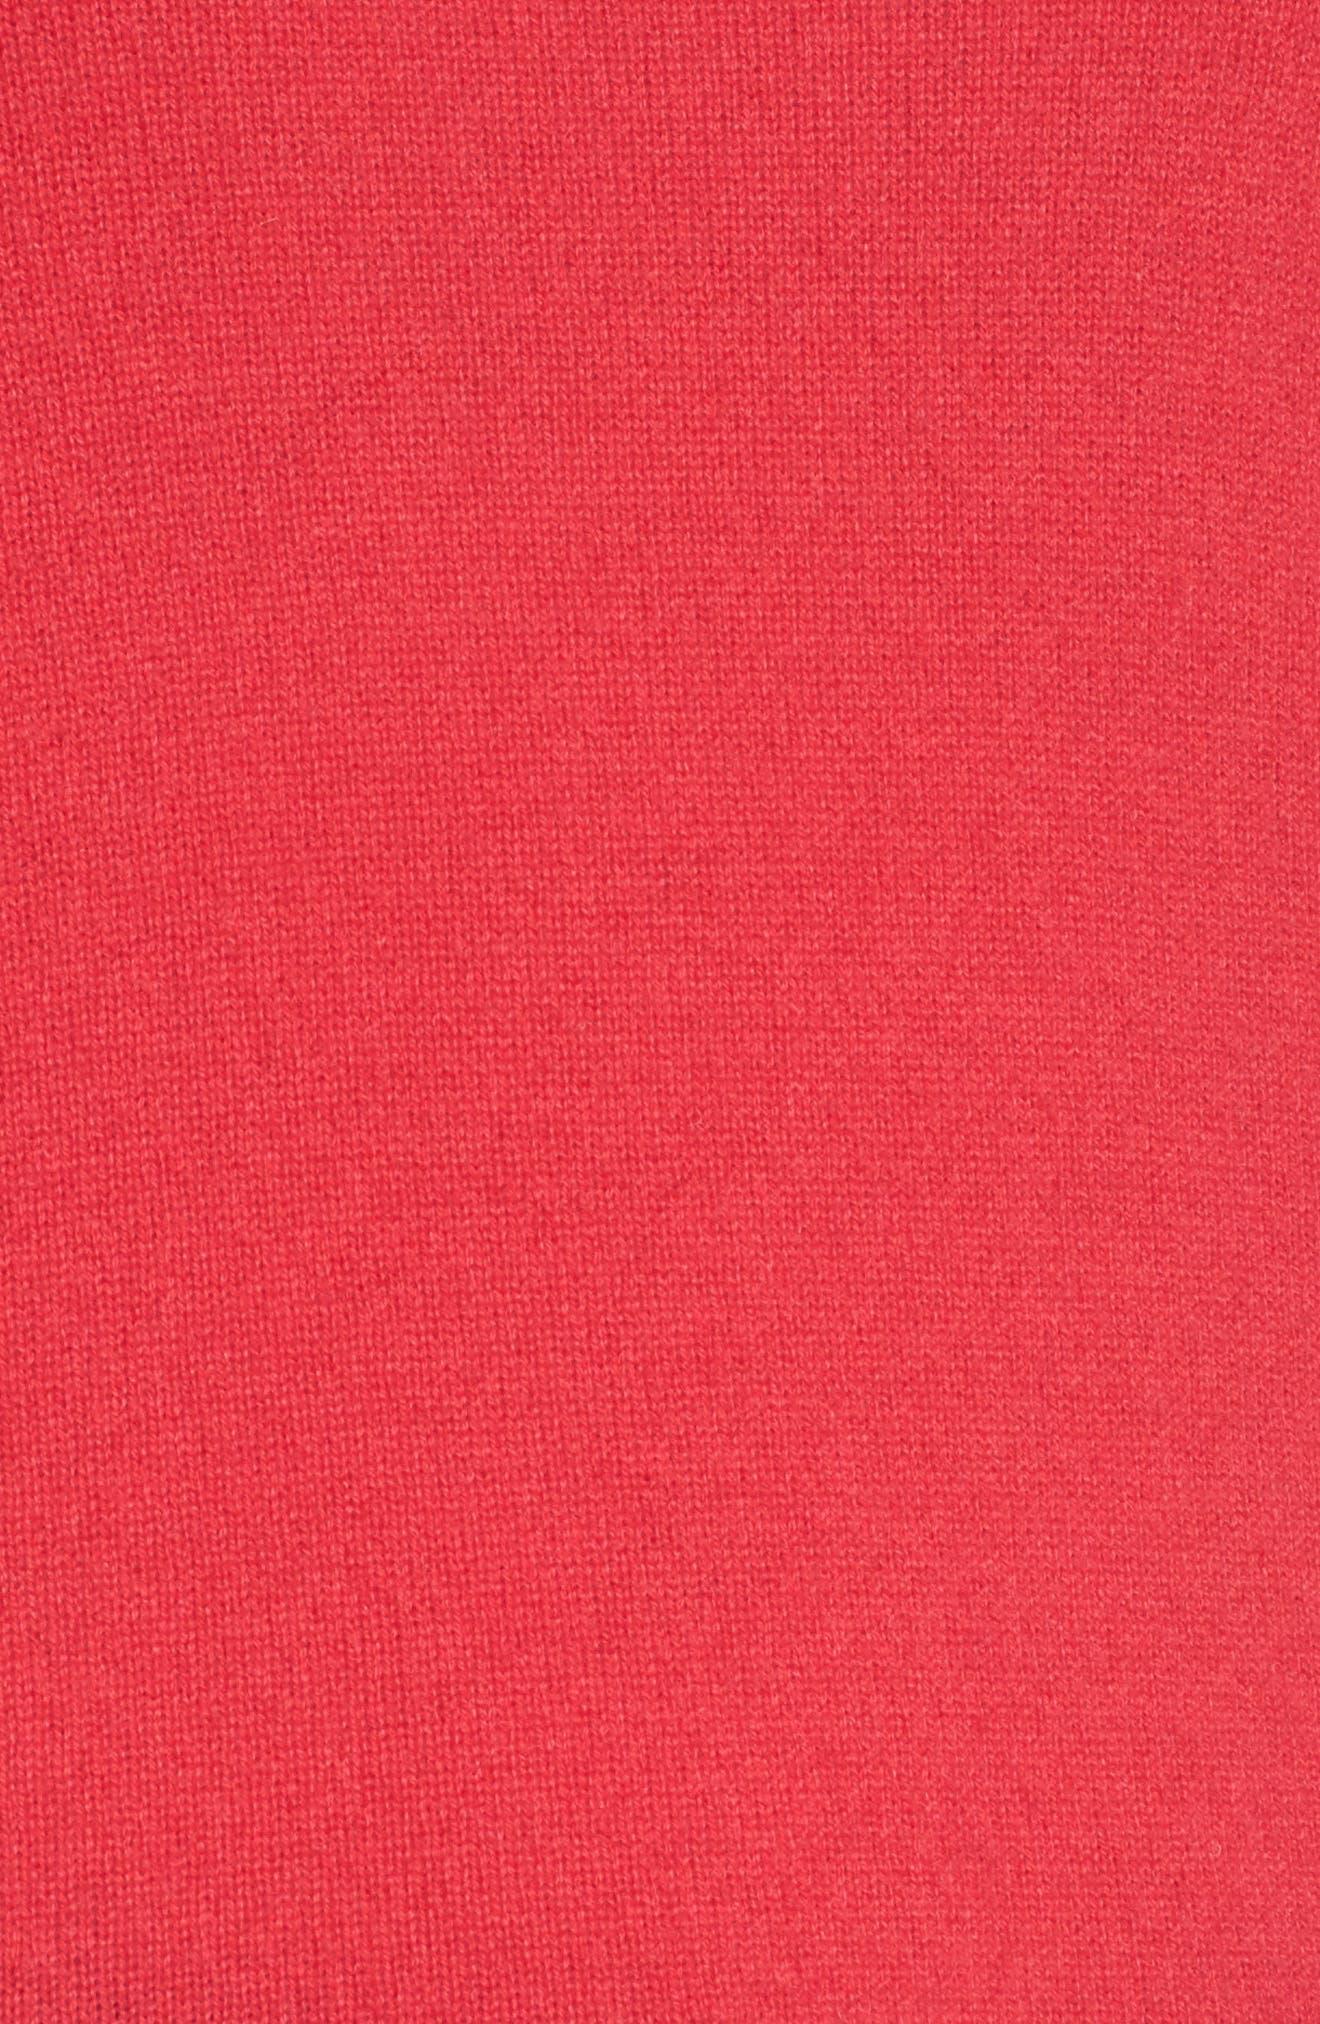 ,                             Crewneck Cashmere Sweater,                             Alternate thumbnail 166, color,                             650